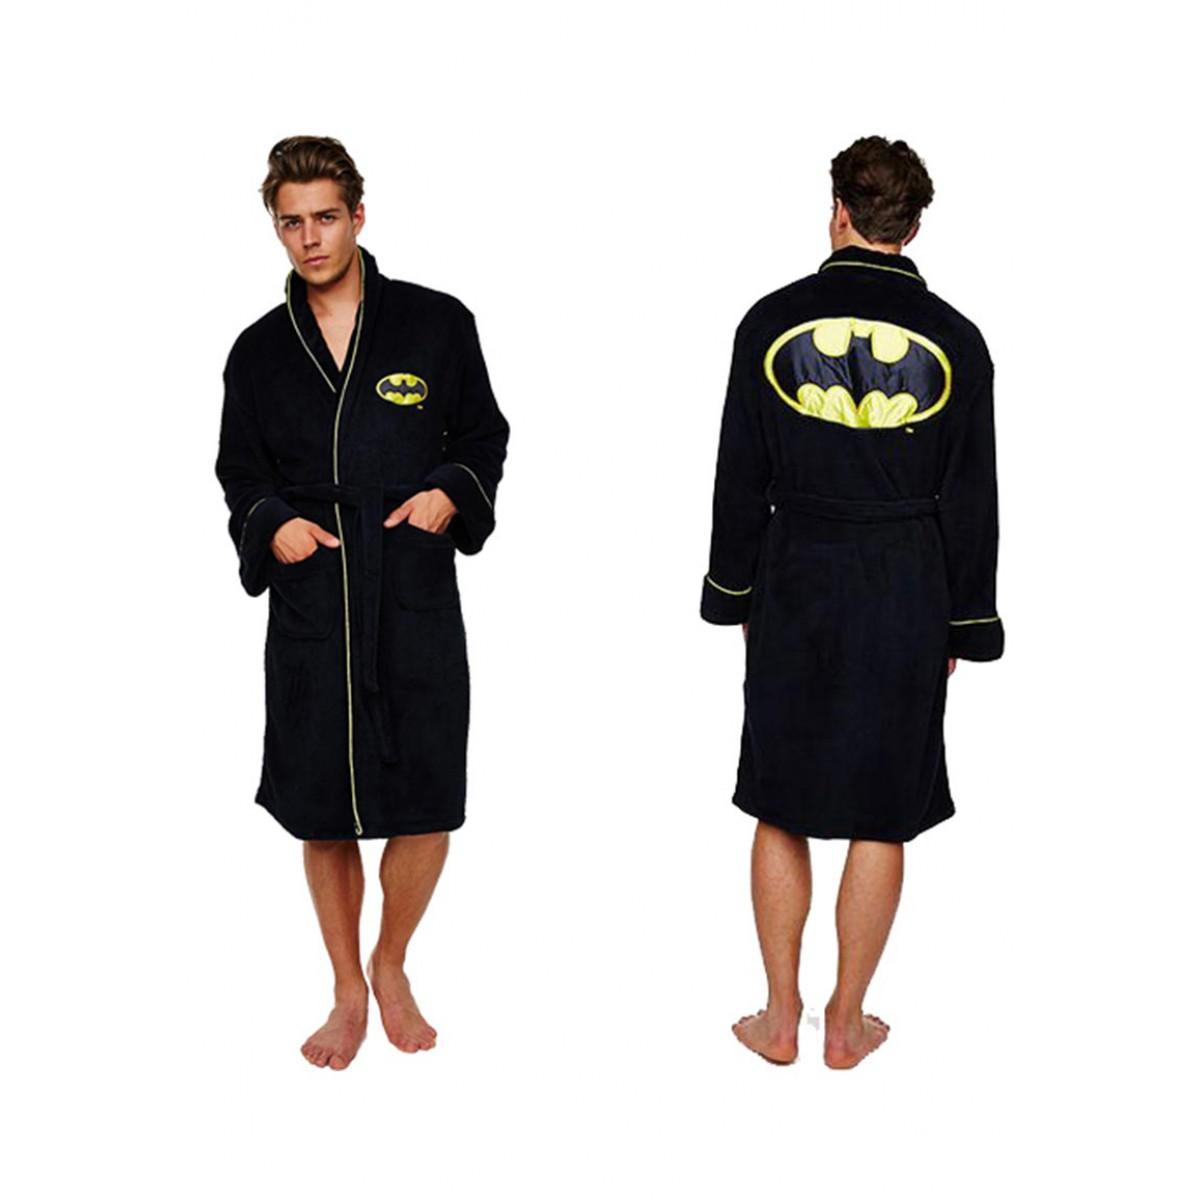 Badjas met batman logo